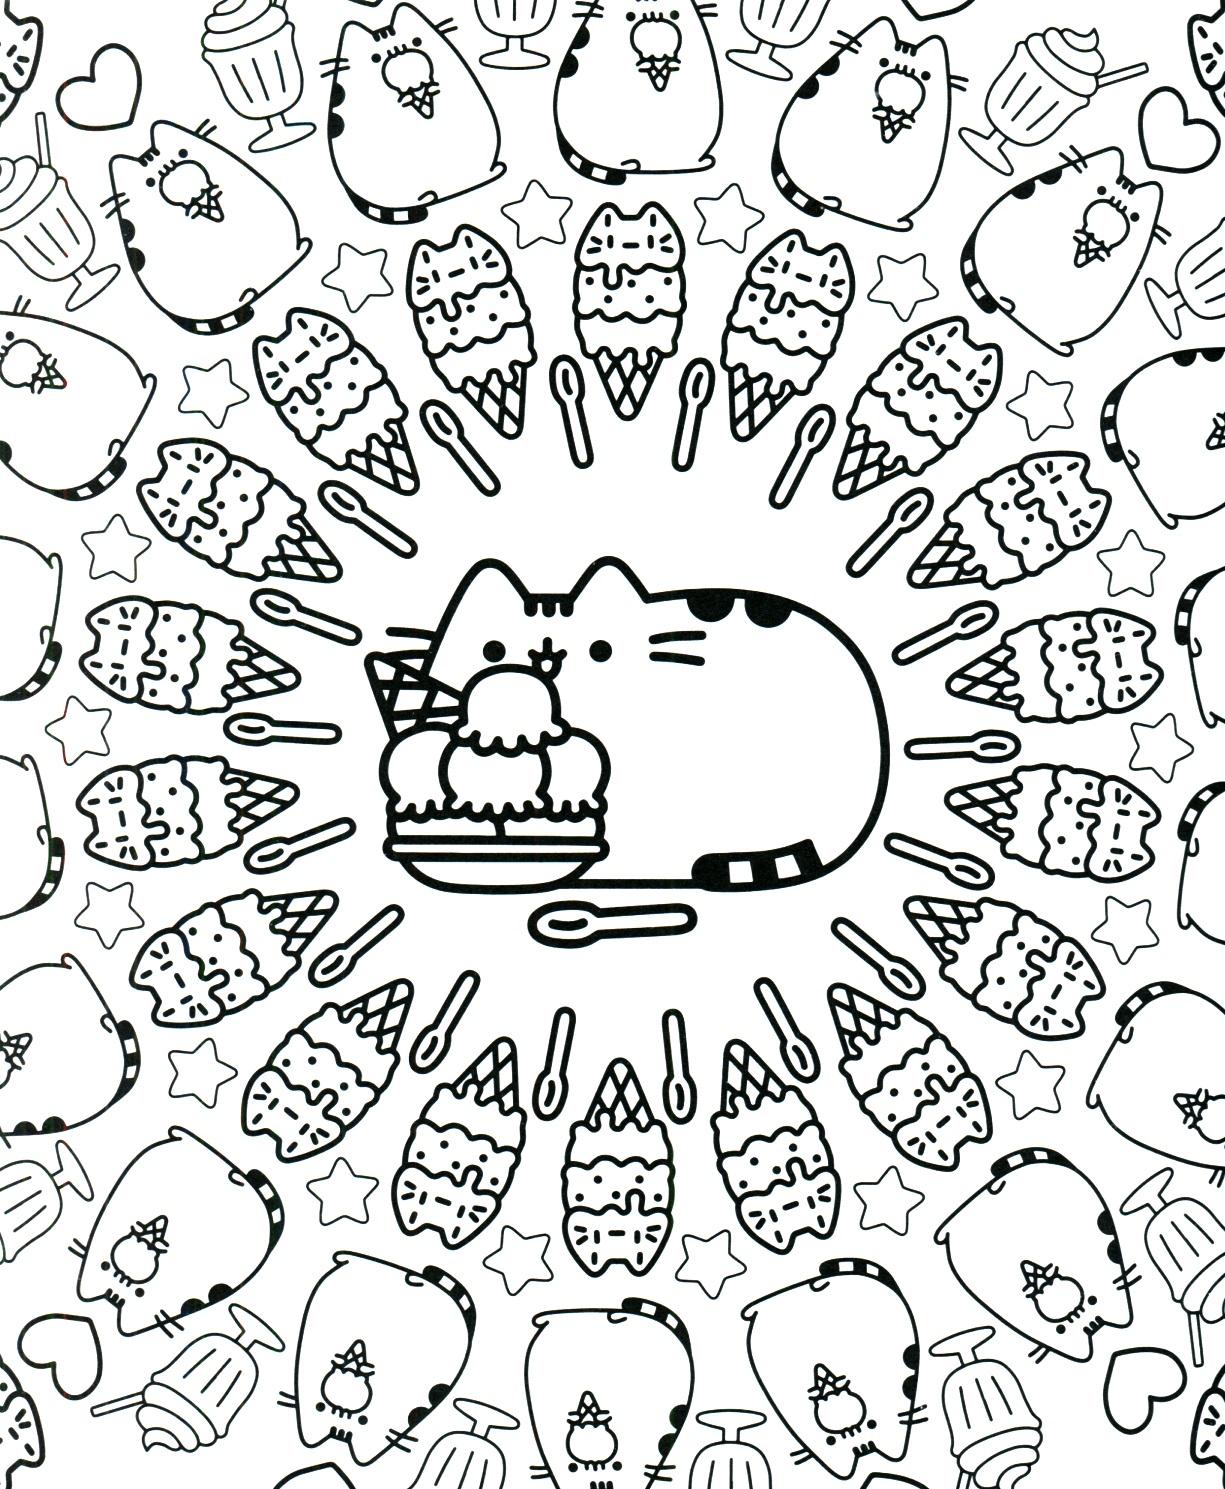 Desenhos para colorir Pushin. Imprimir gratuitamente, 60 imagens